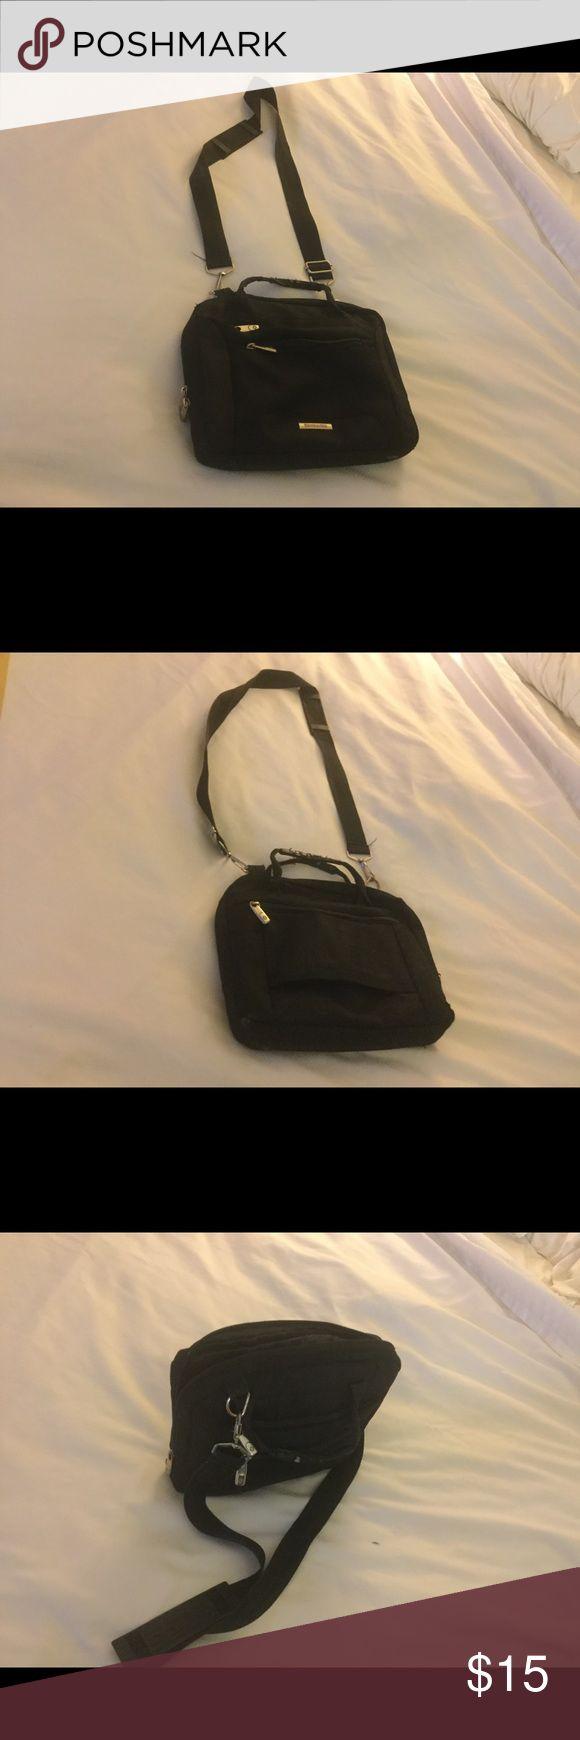 Samsonite handbag for 10.1 inch tablet Samsonite handbag for 10.1 inch tablet with sign of use. The zipper of one of the front pocket is broken. The other two pockets looks good.It looks fine inside Samsonite Bags Mini Bags